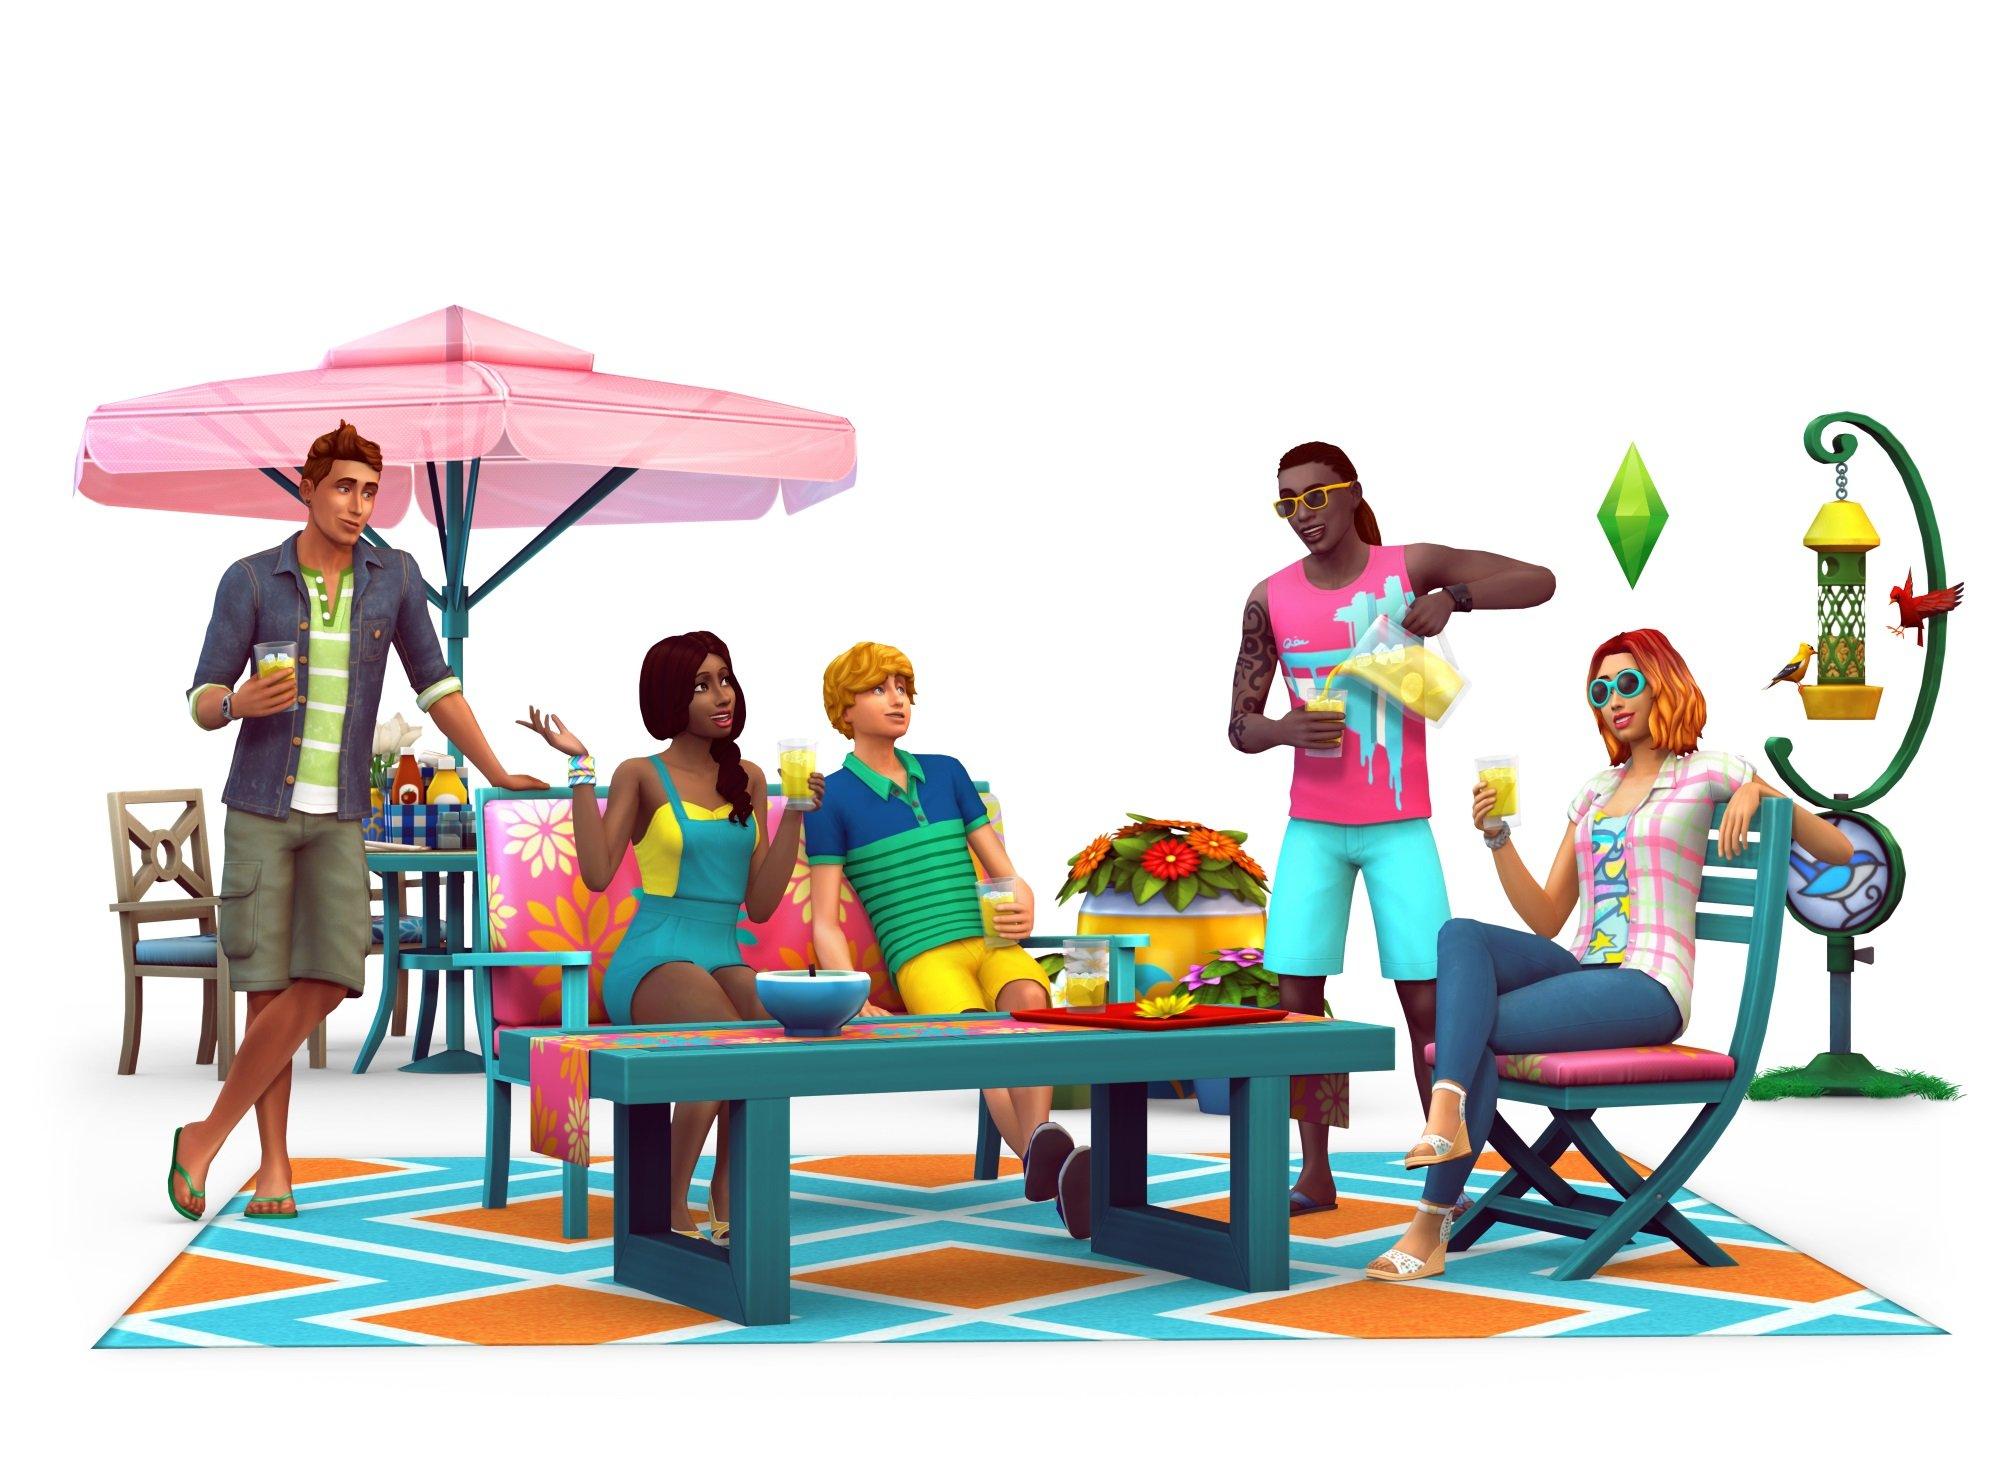 amazon com the sims 4 backyard stuff online game code video games